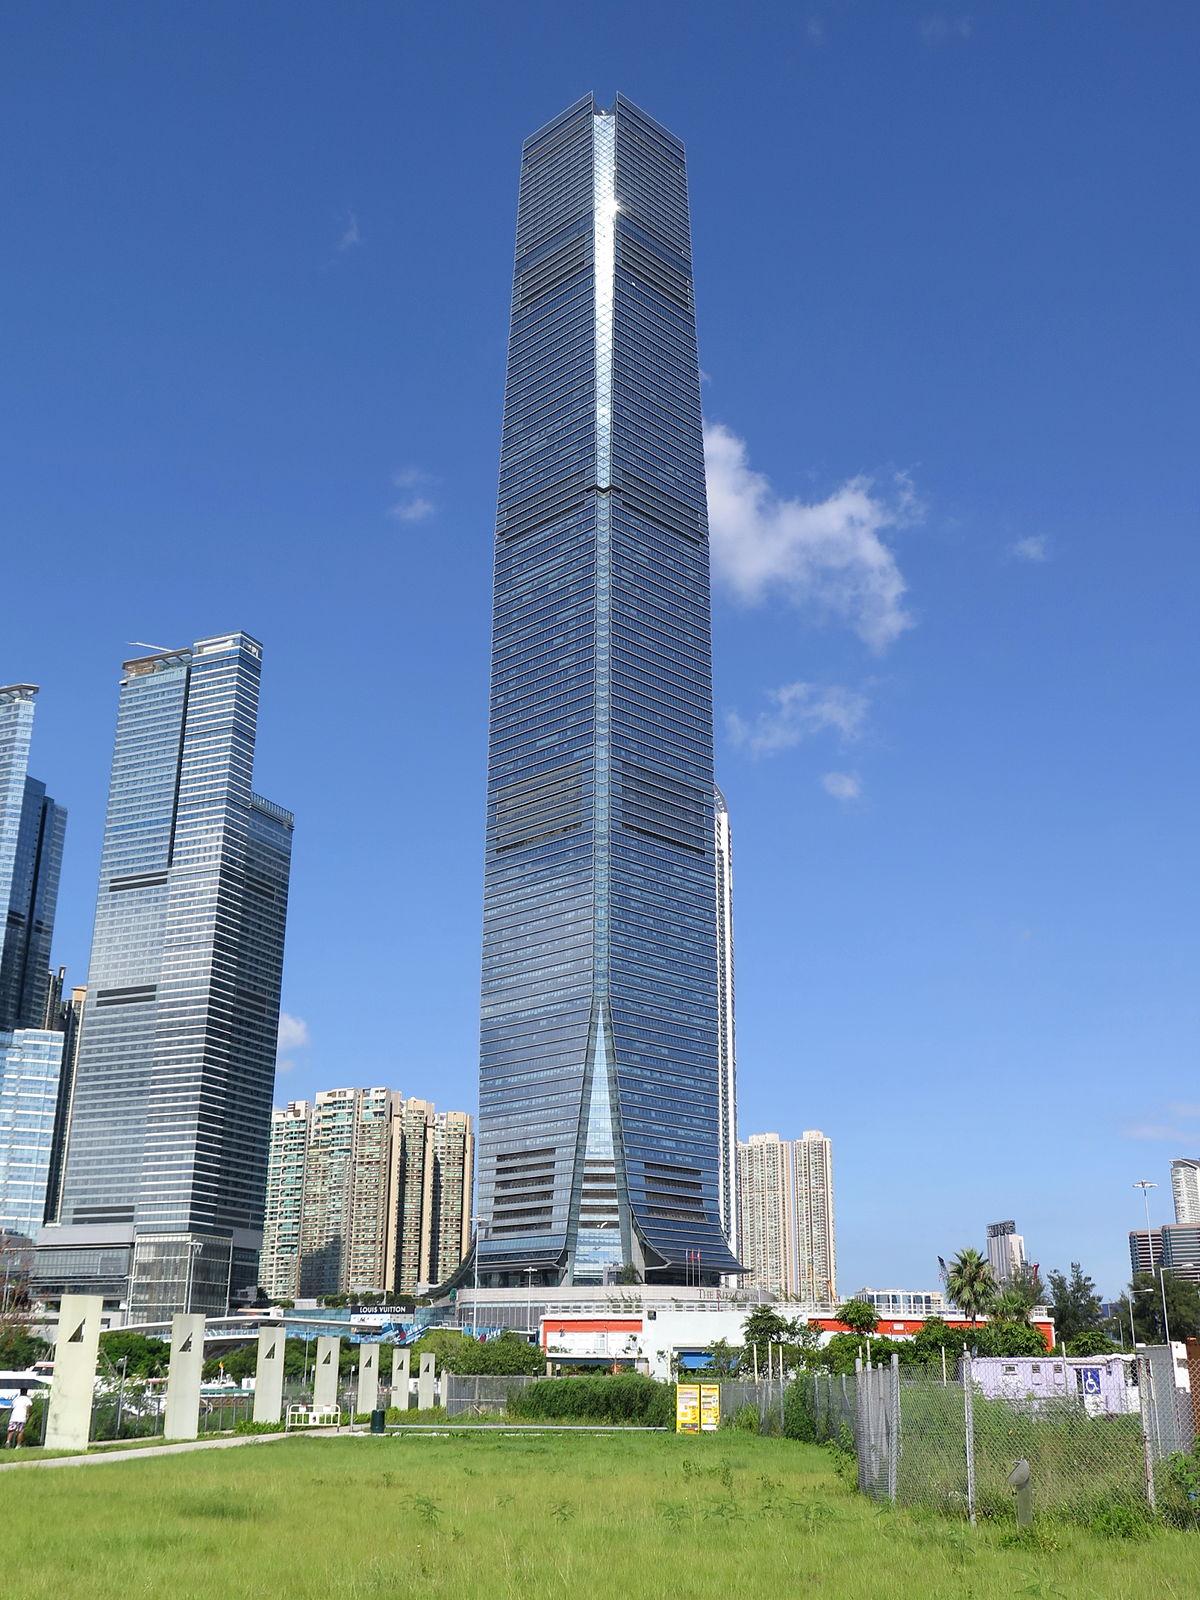 International Commerce Centre - Wikipedia